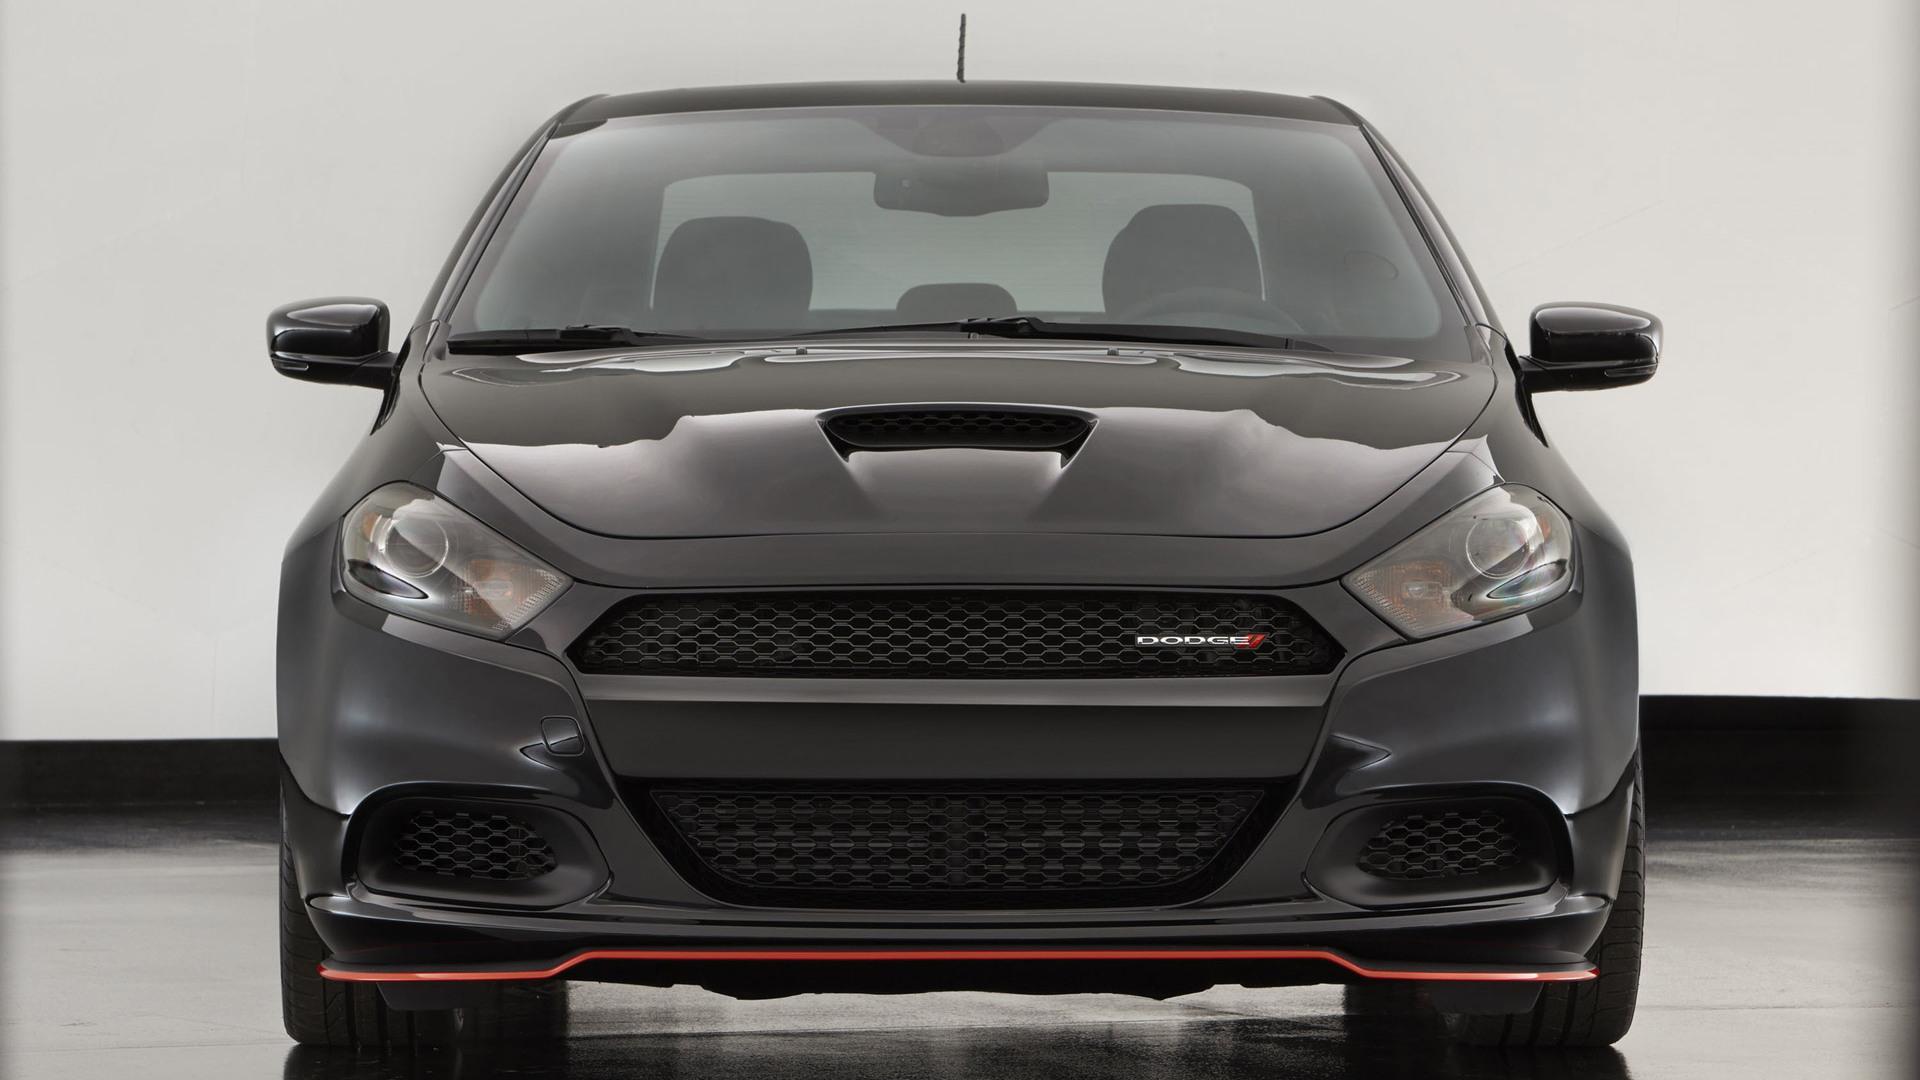 Dodge Dart GLH concept, 2015 SEMA show